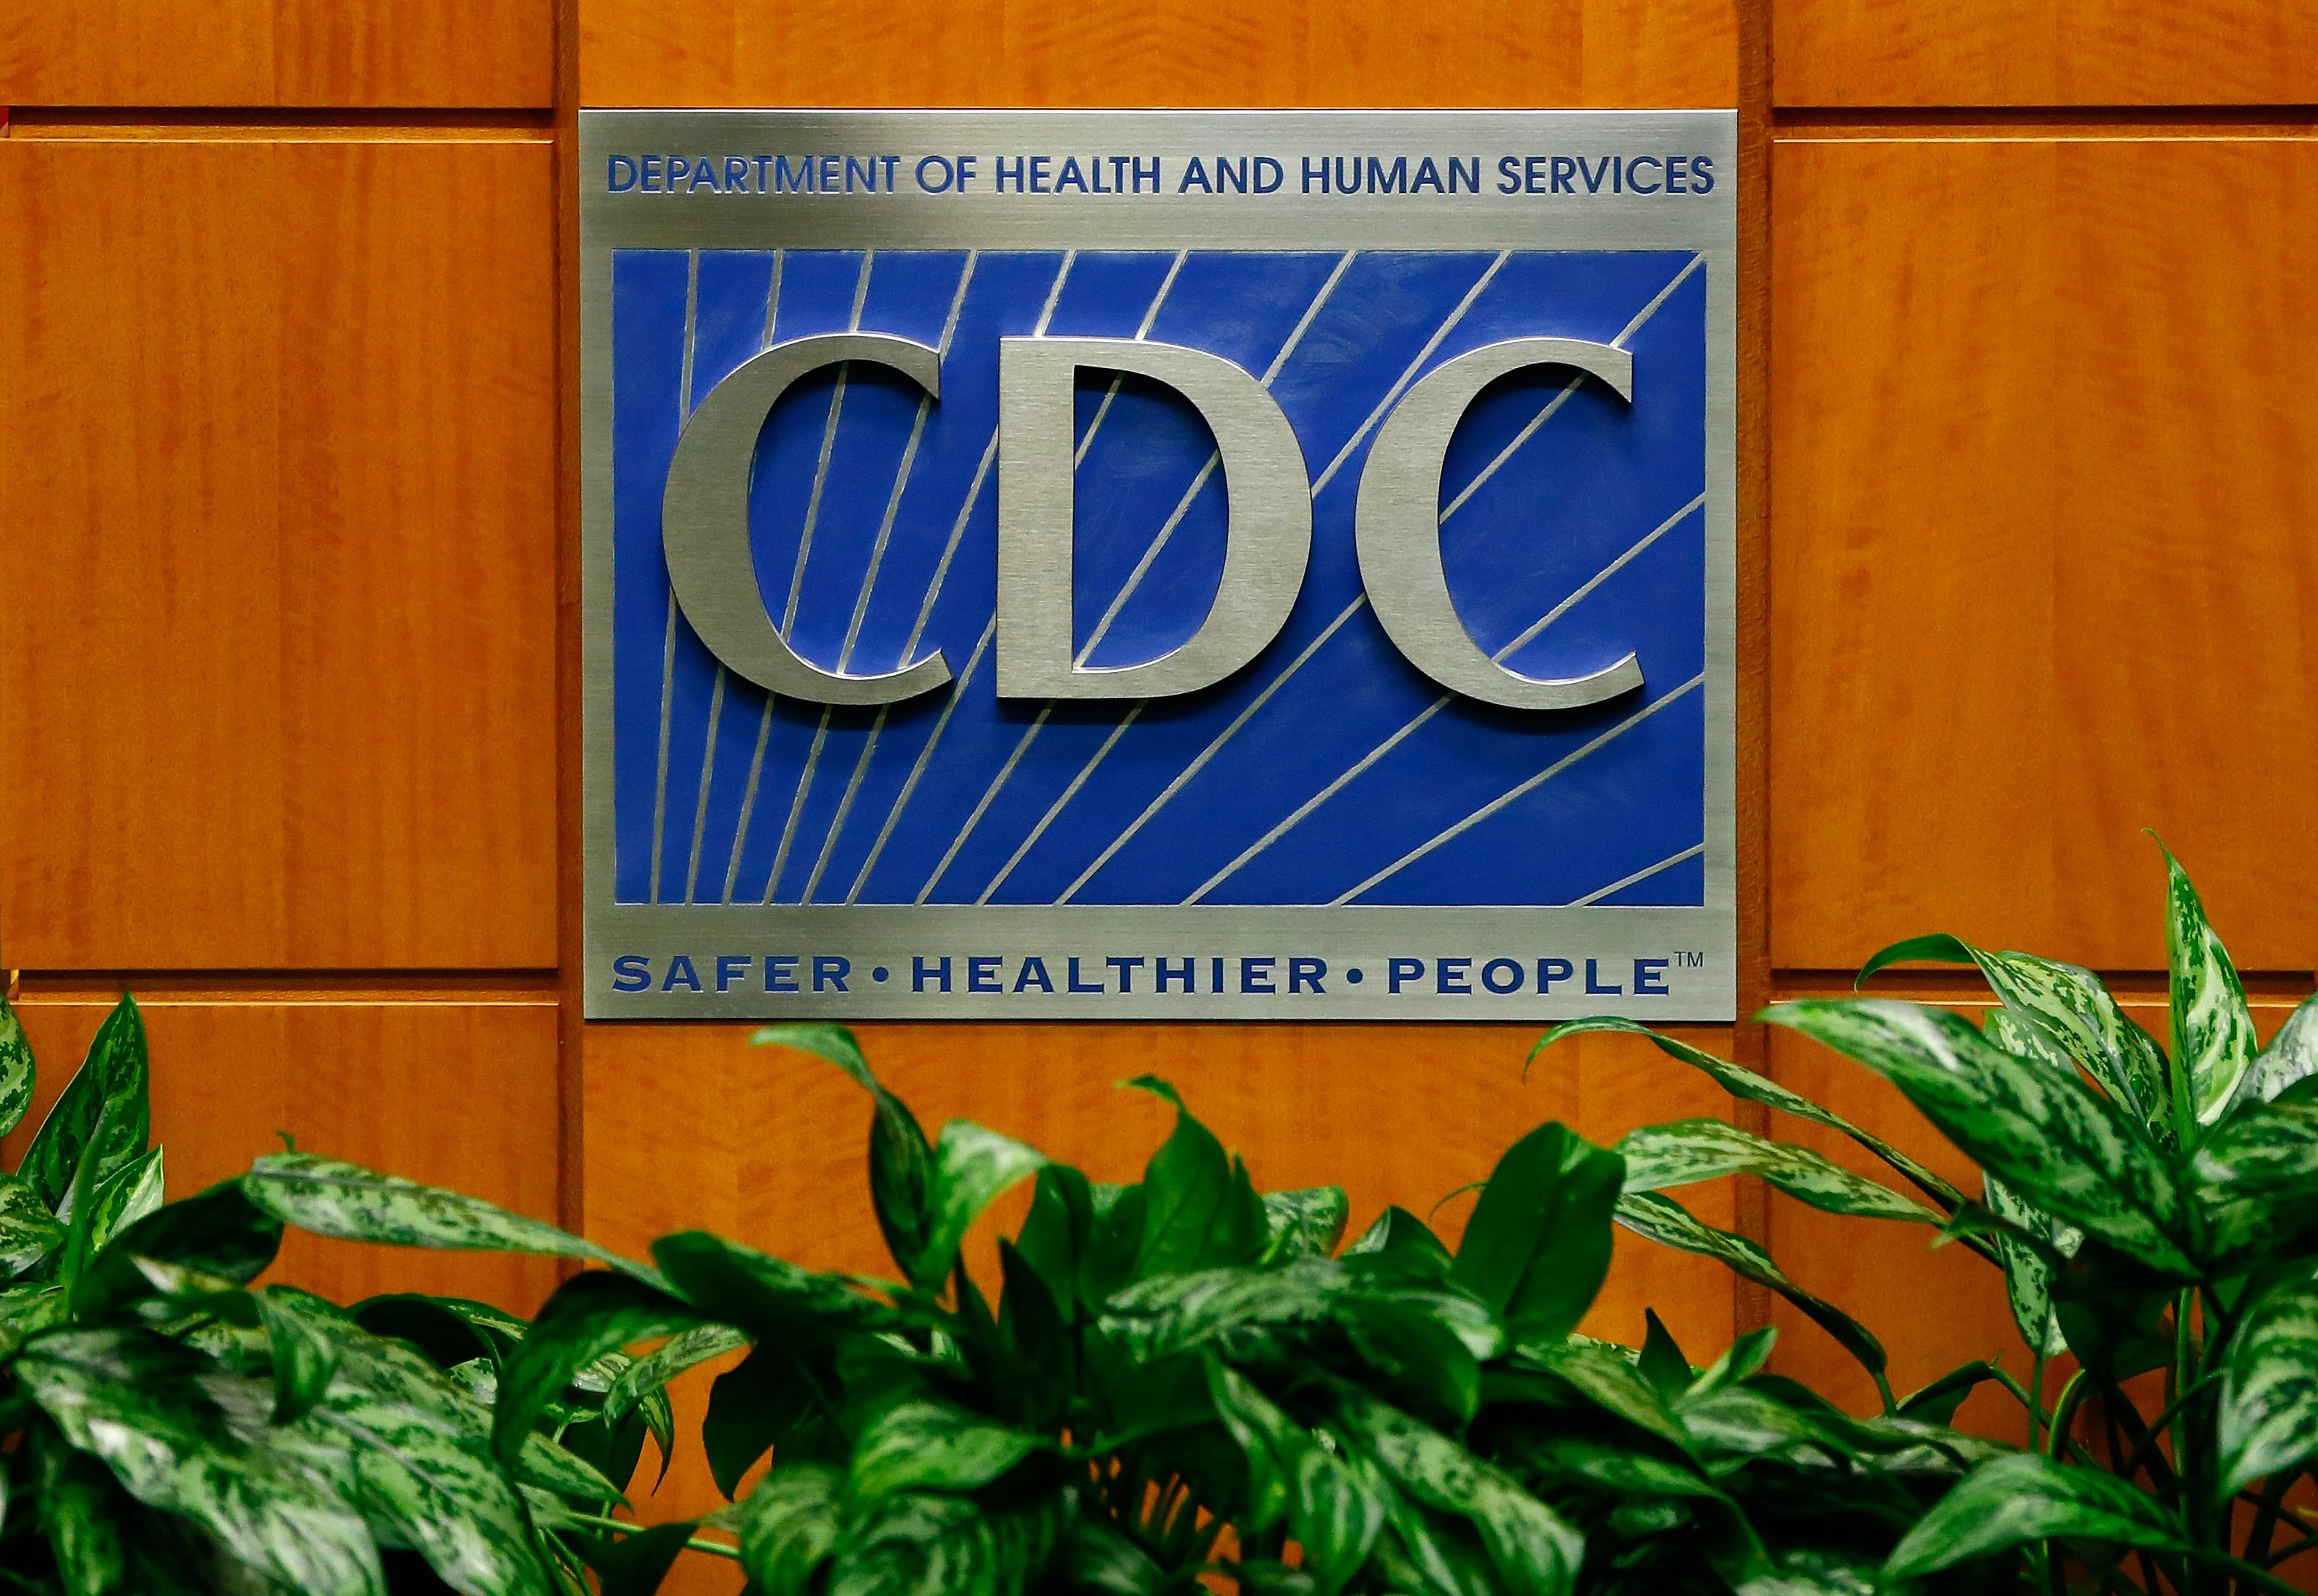 Center For Disease Control Director Tom Frieden Addresses The Media On Ebola Case In U.S.